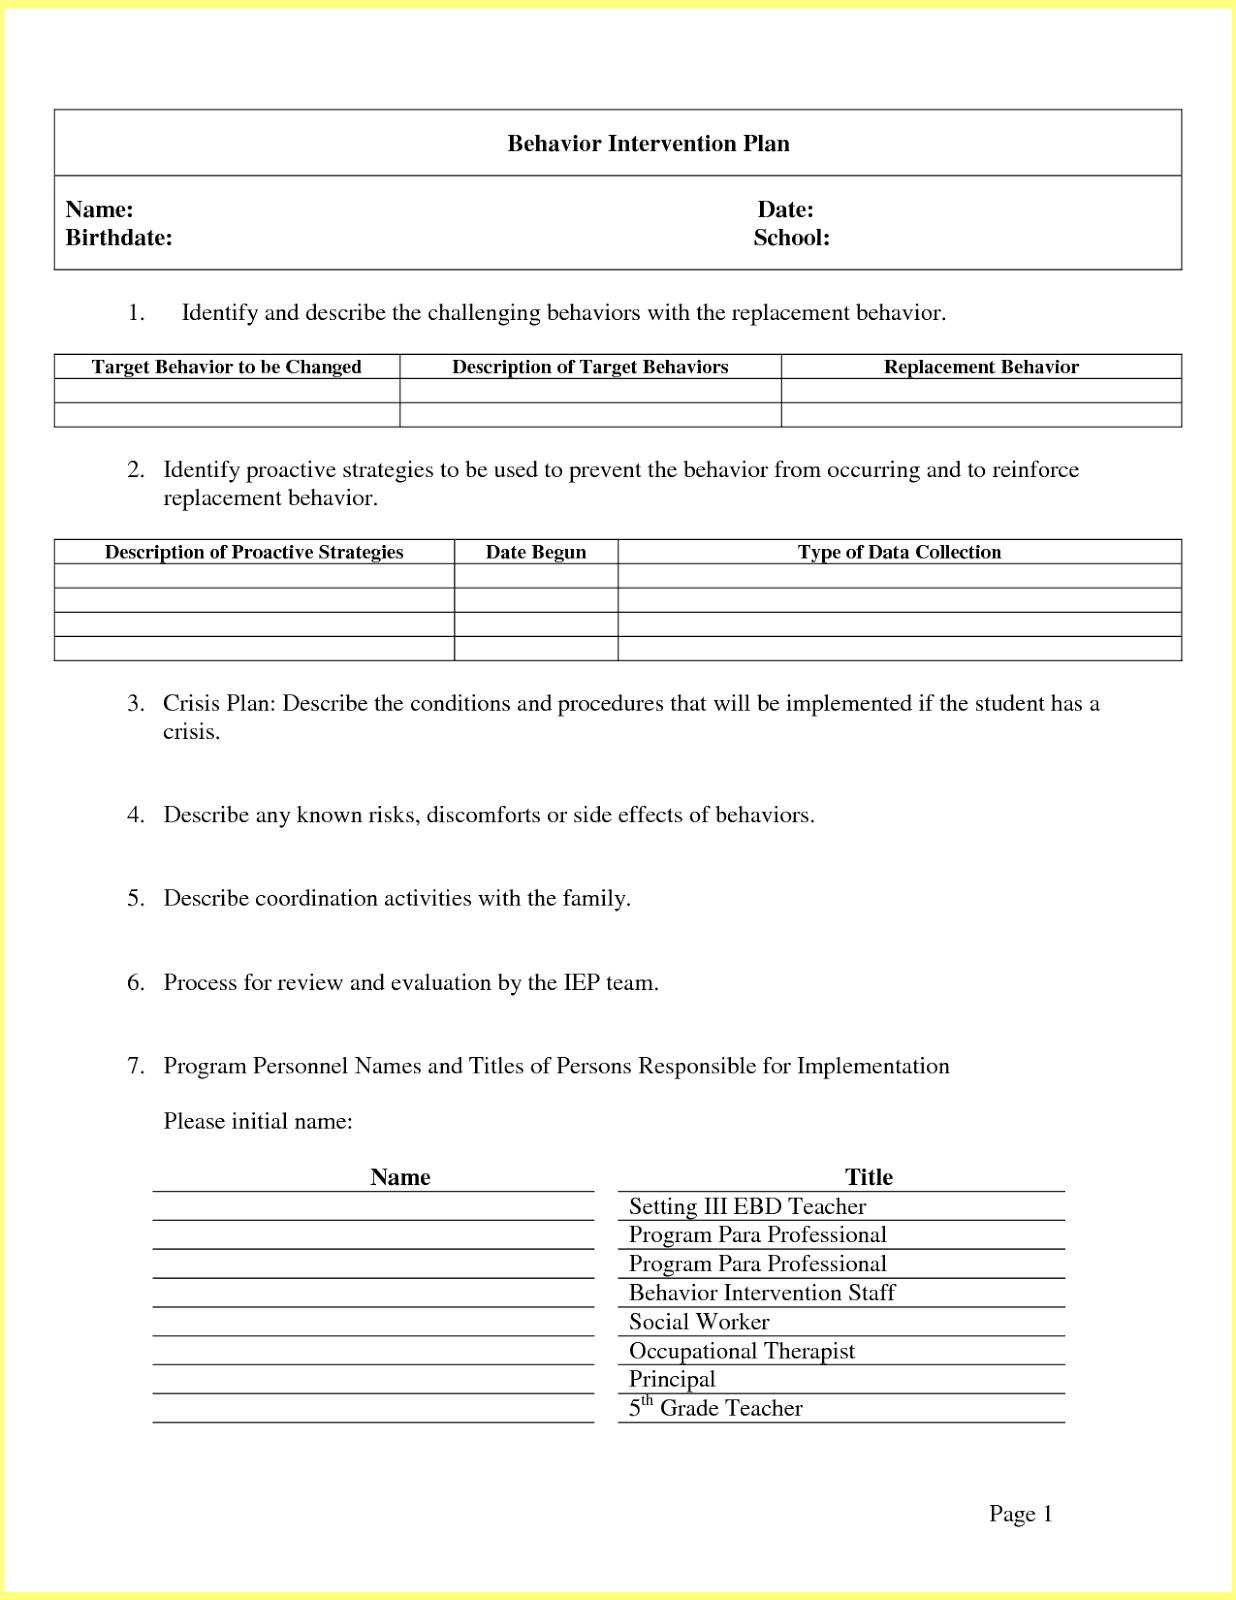 Behavior Intervention Plan Template | Resume Letter Business